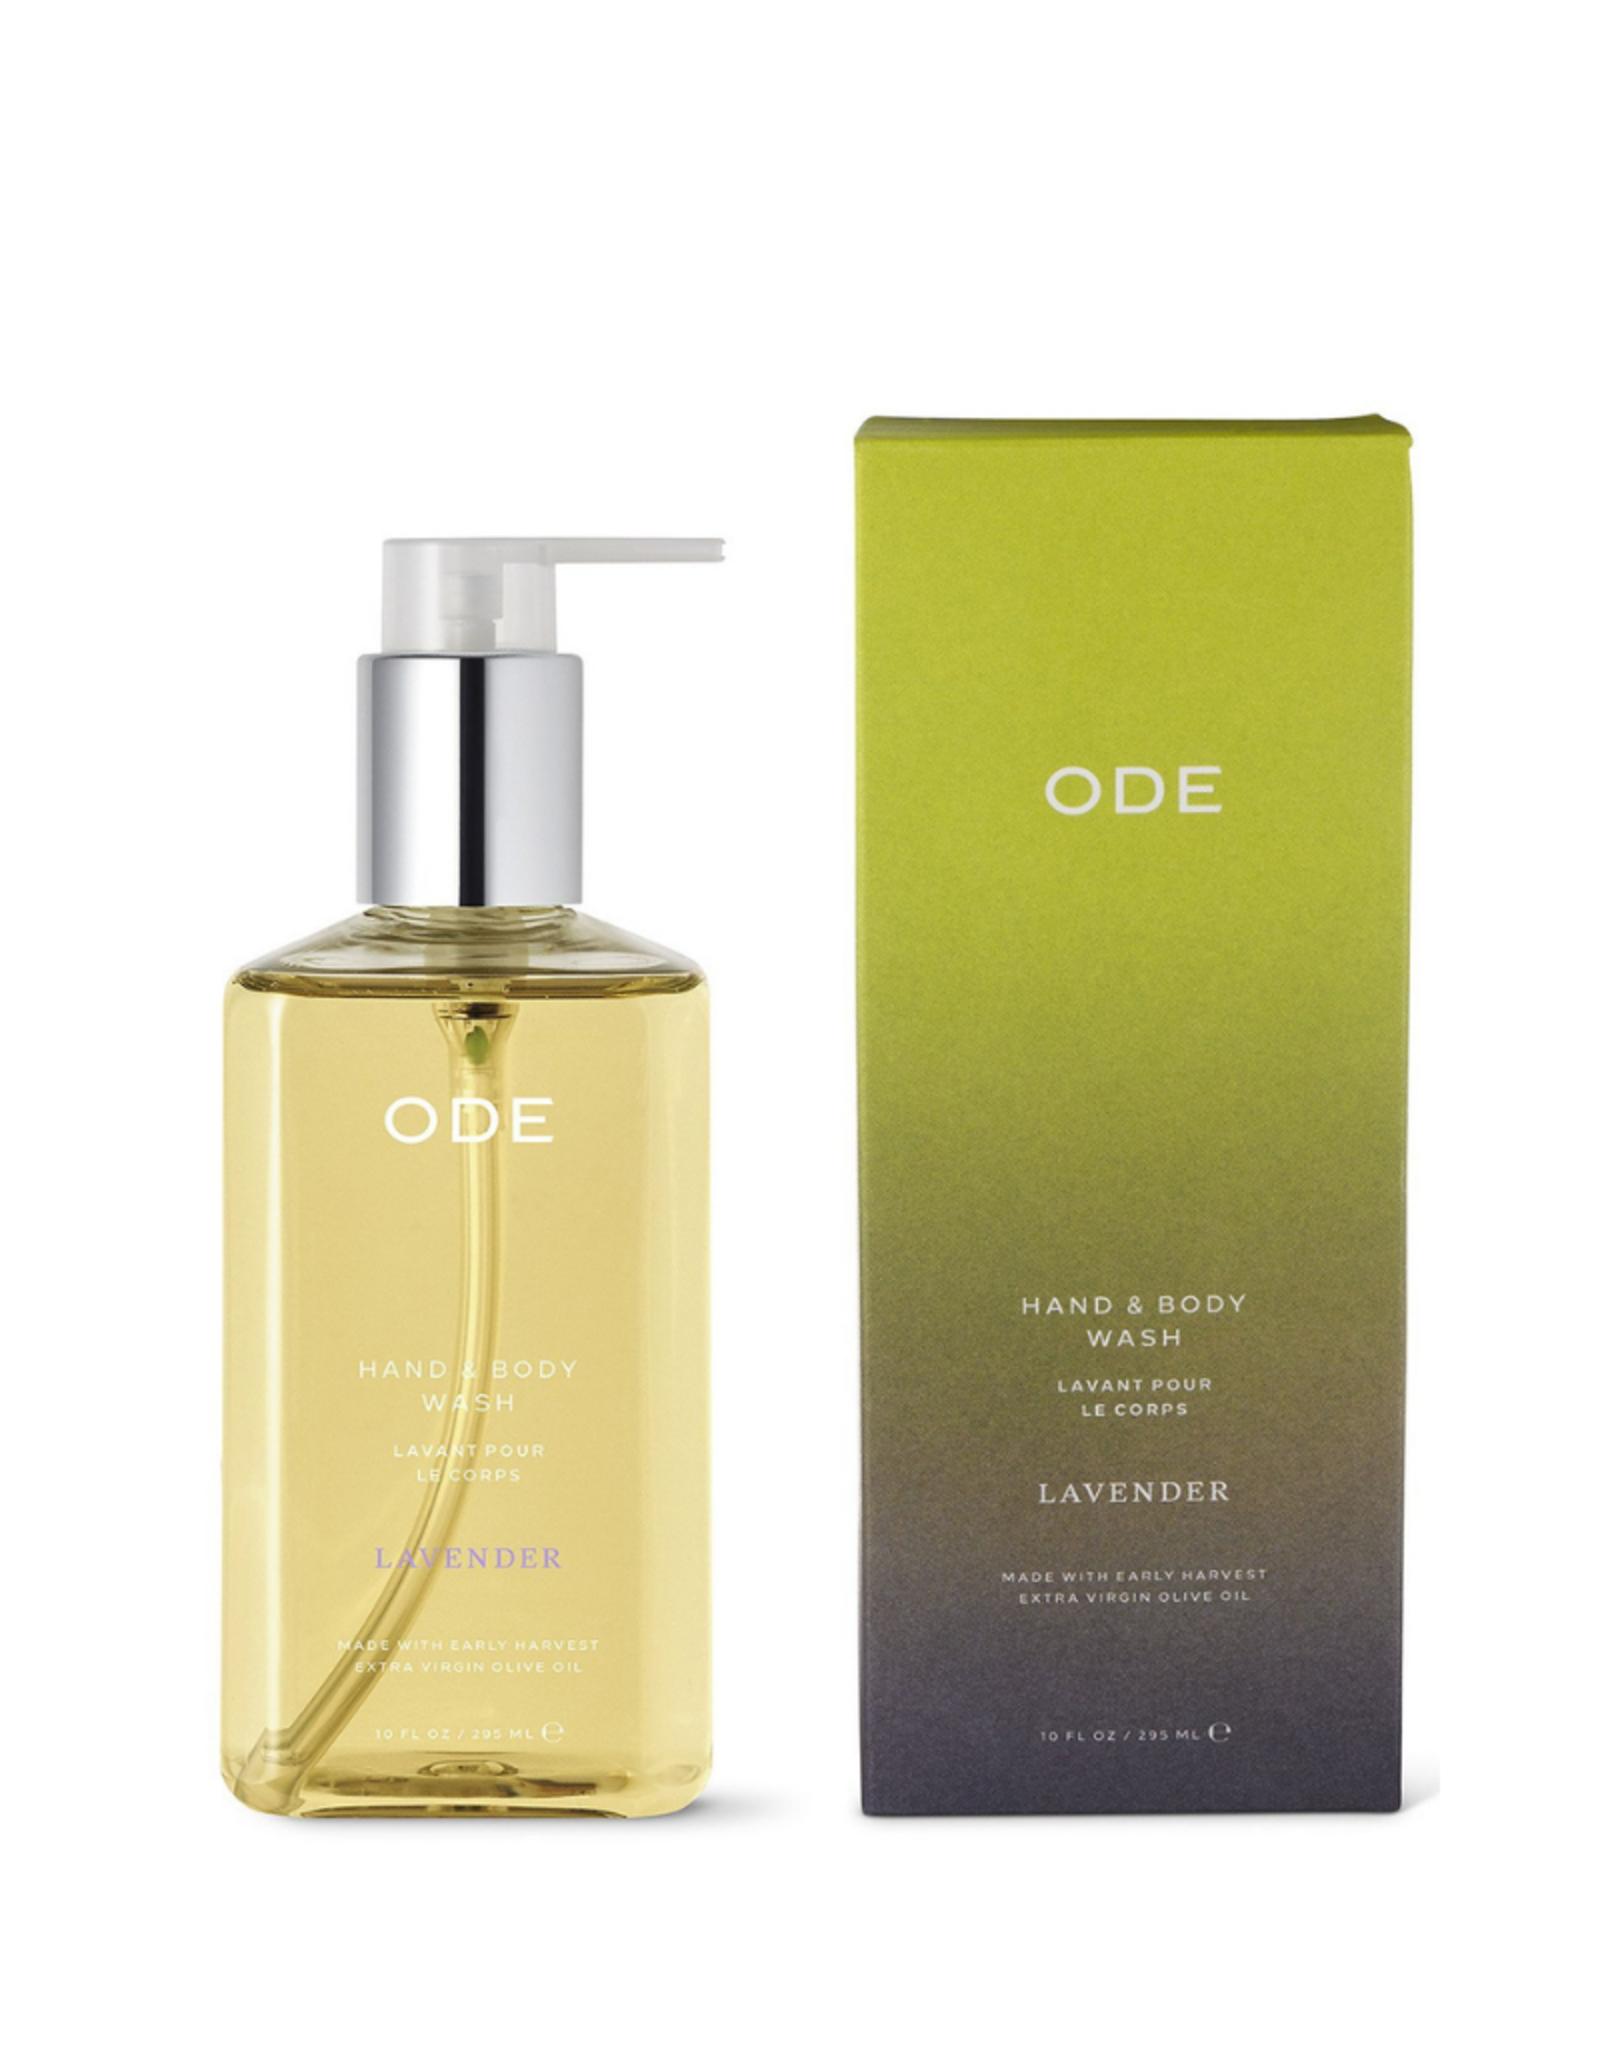 ODE ODE Lavender Hand & Body Wash